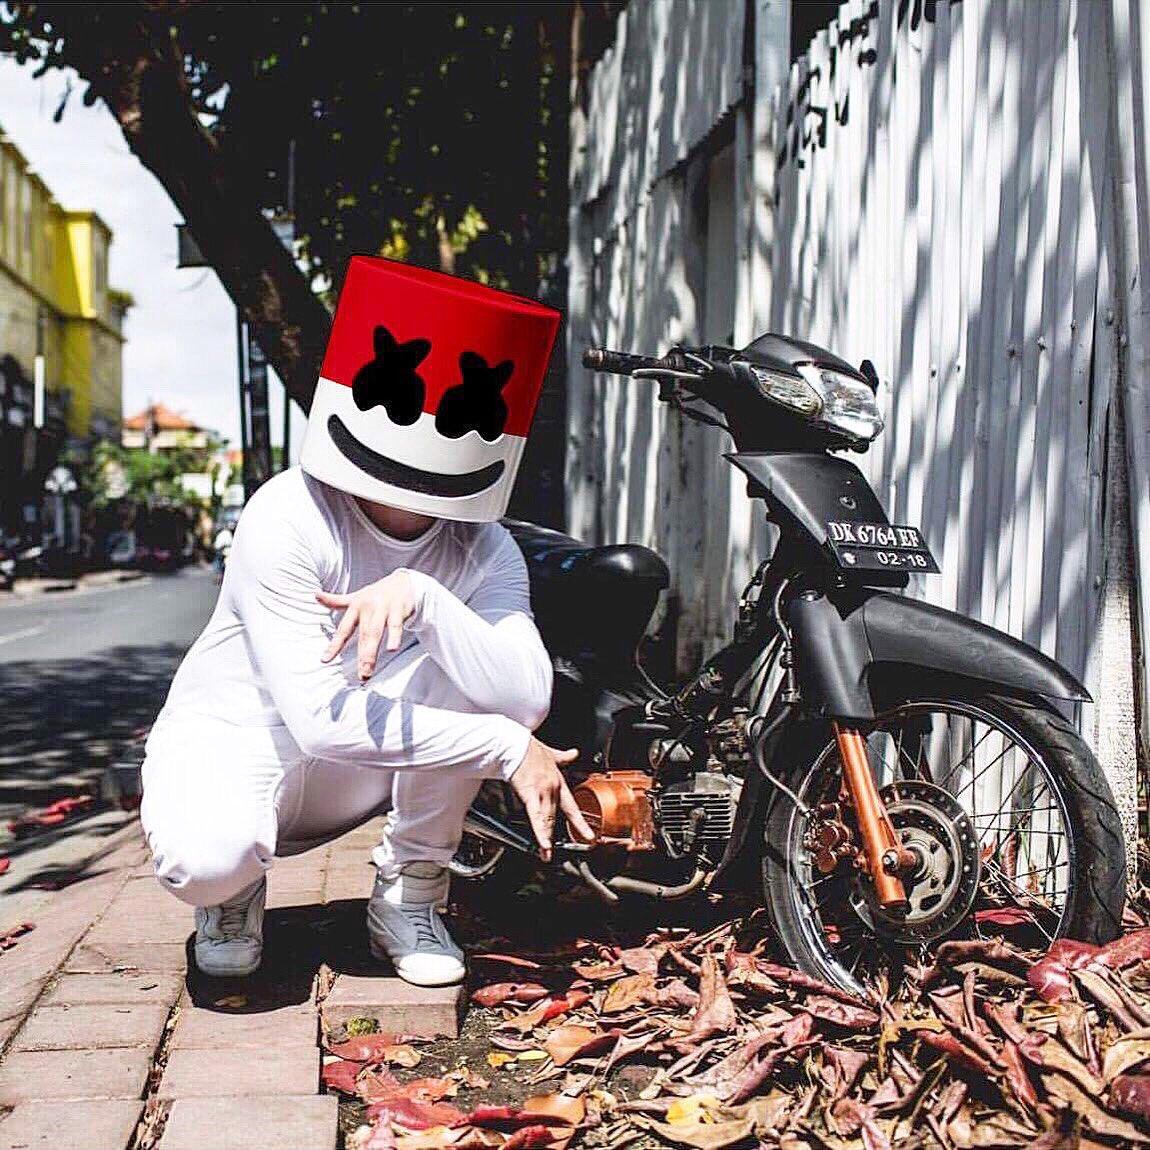 Download Lagu Happier Marshmello Laguaz: Wow, DJ Marshmello Ikut Rayakan Dirgahayu Indonesia Ke-72